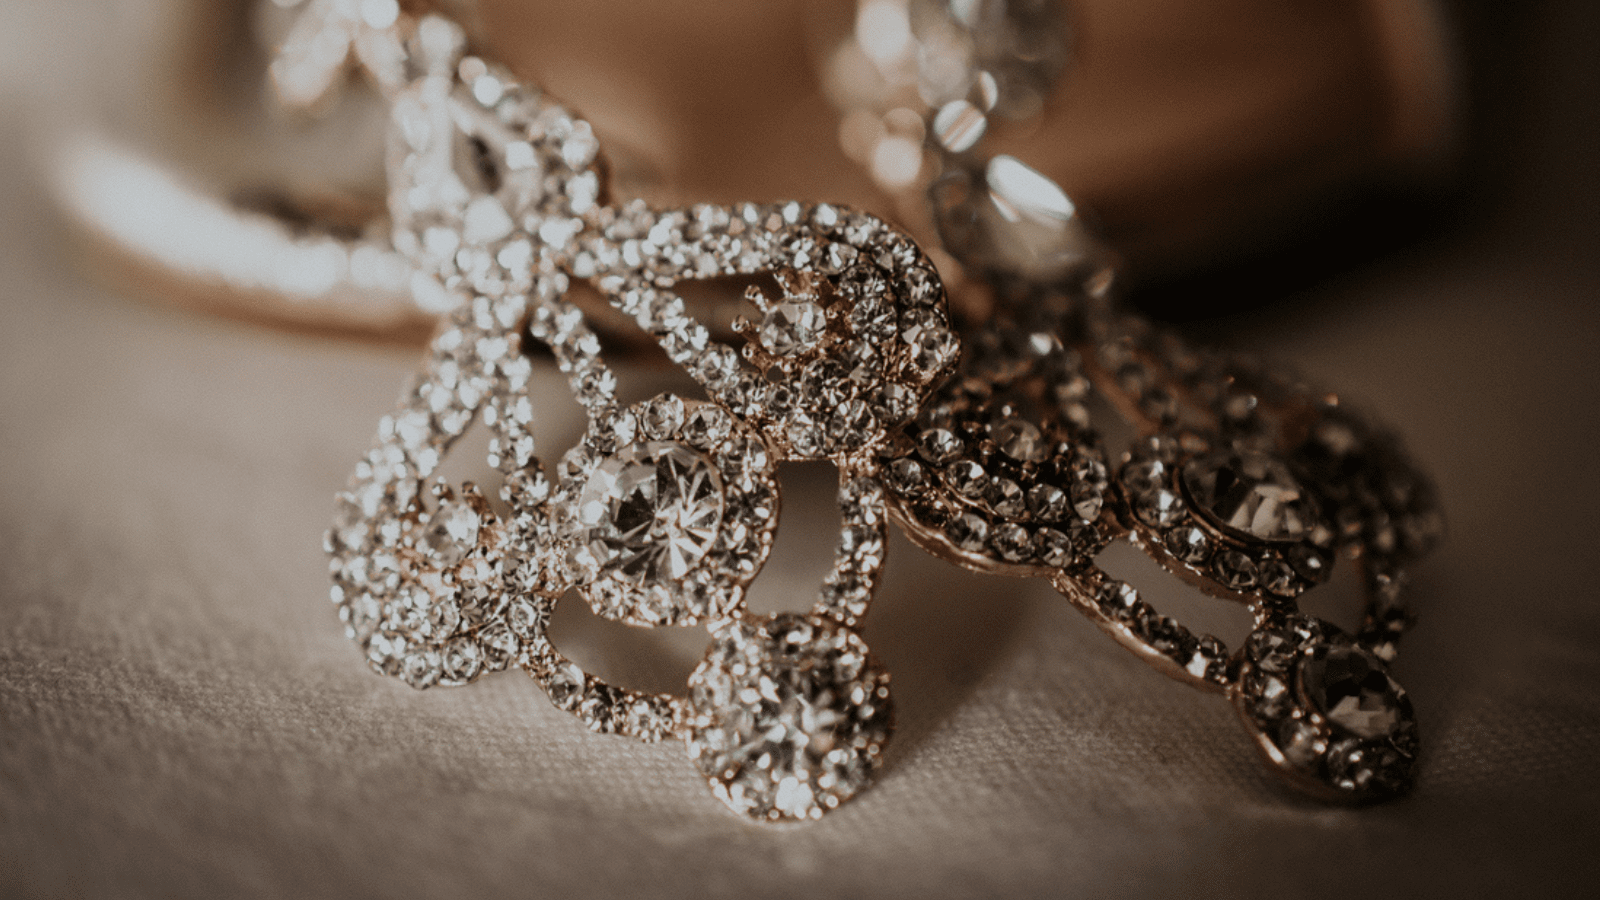 Autumn Winter trends 2021/22 - This Season Jewellery Trends